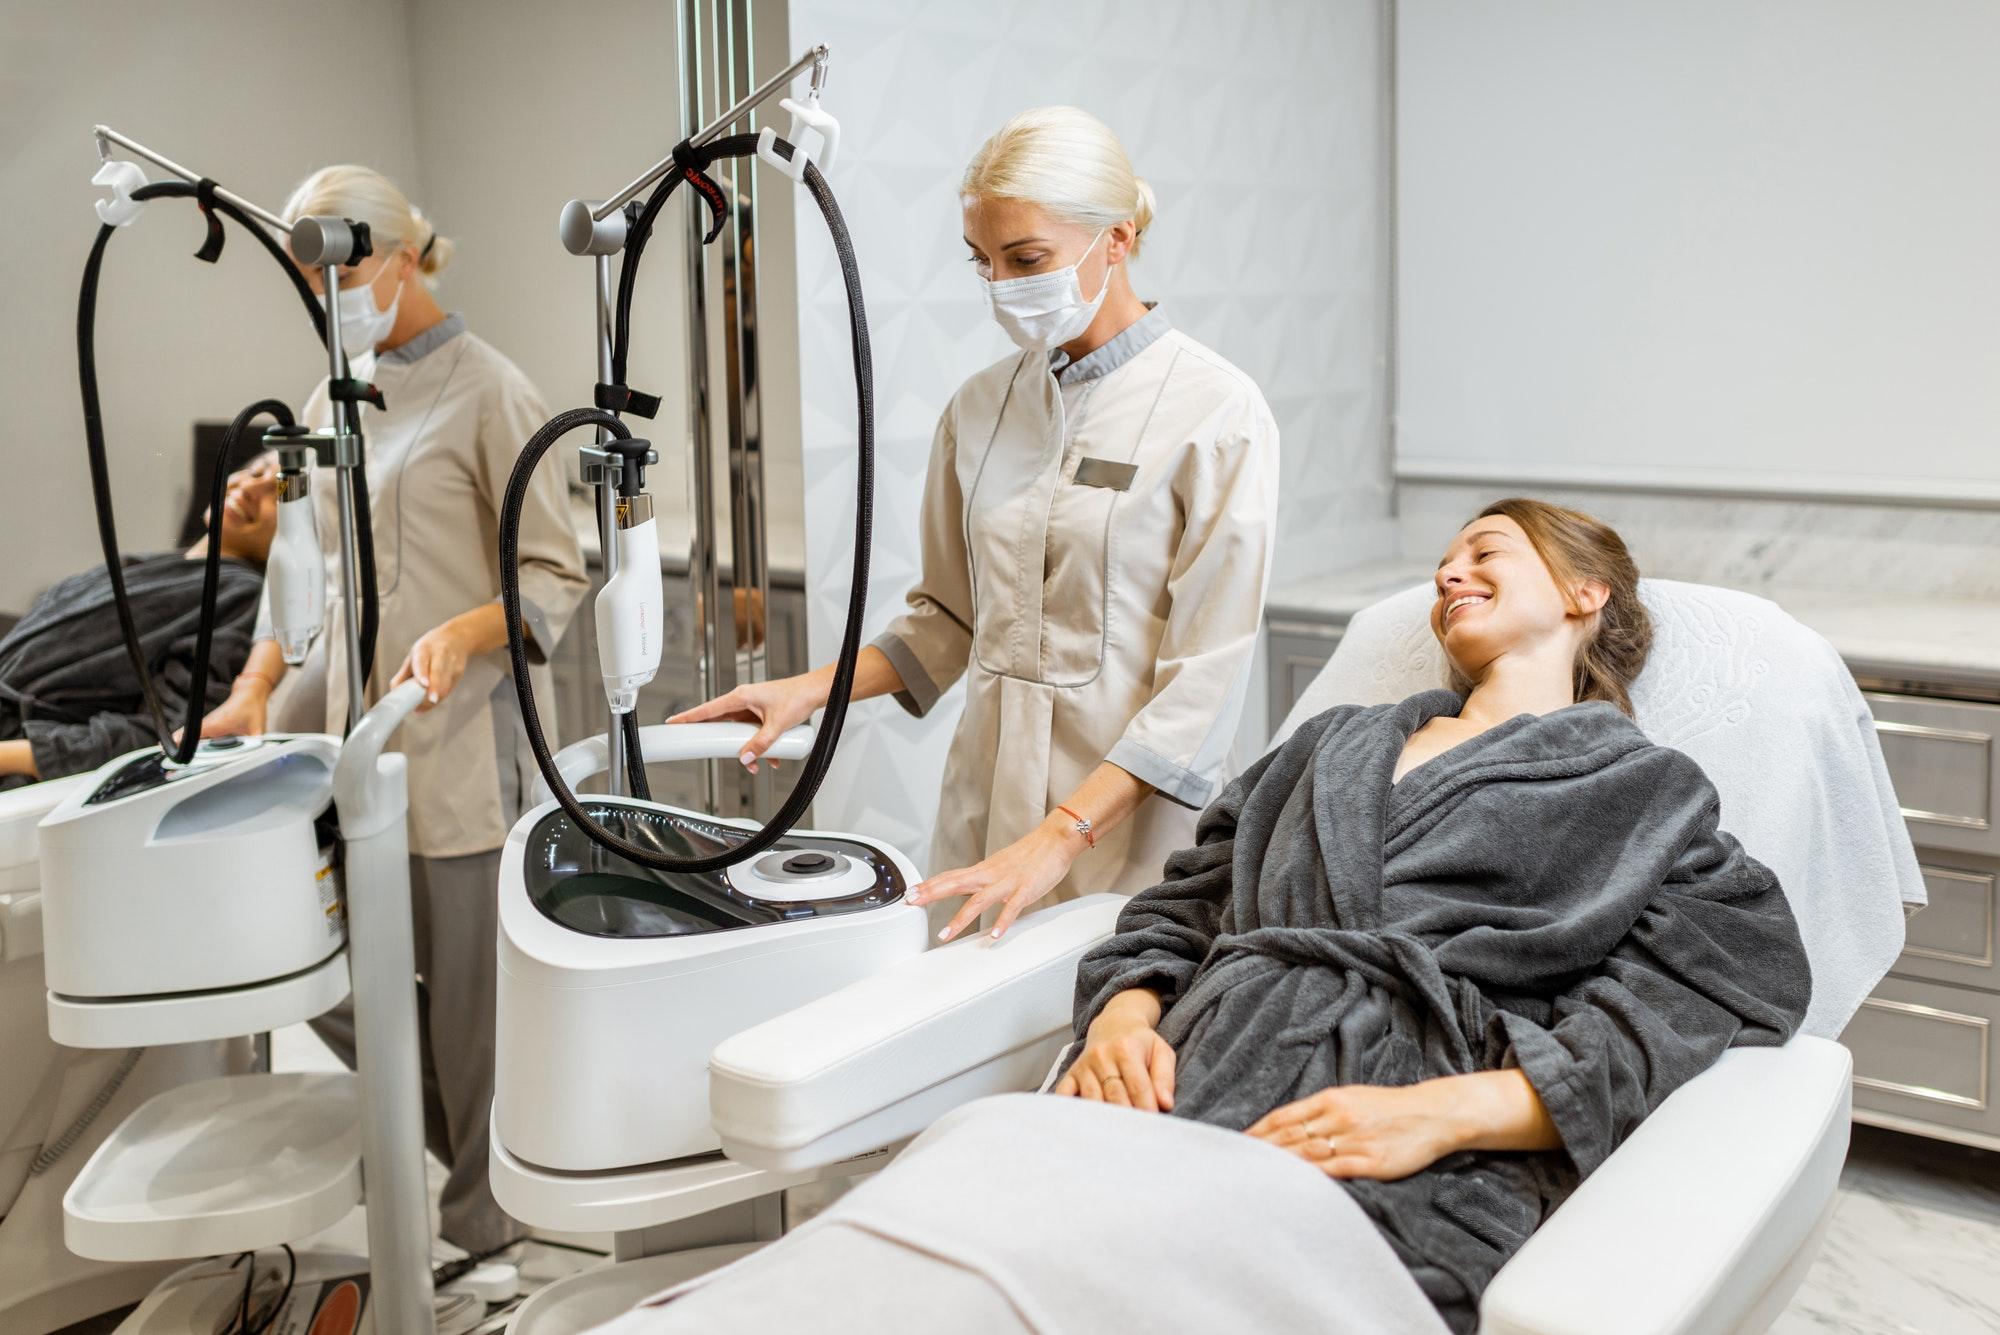 Woman during facial rejuvenation treatment